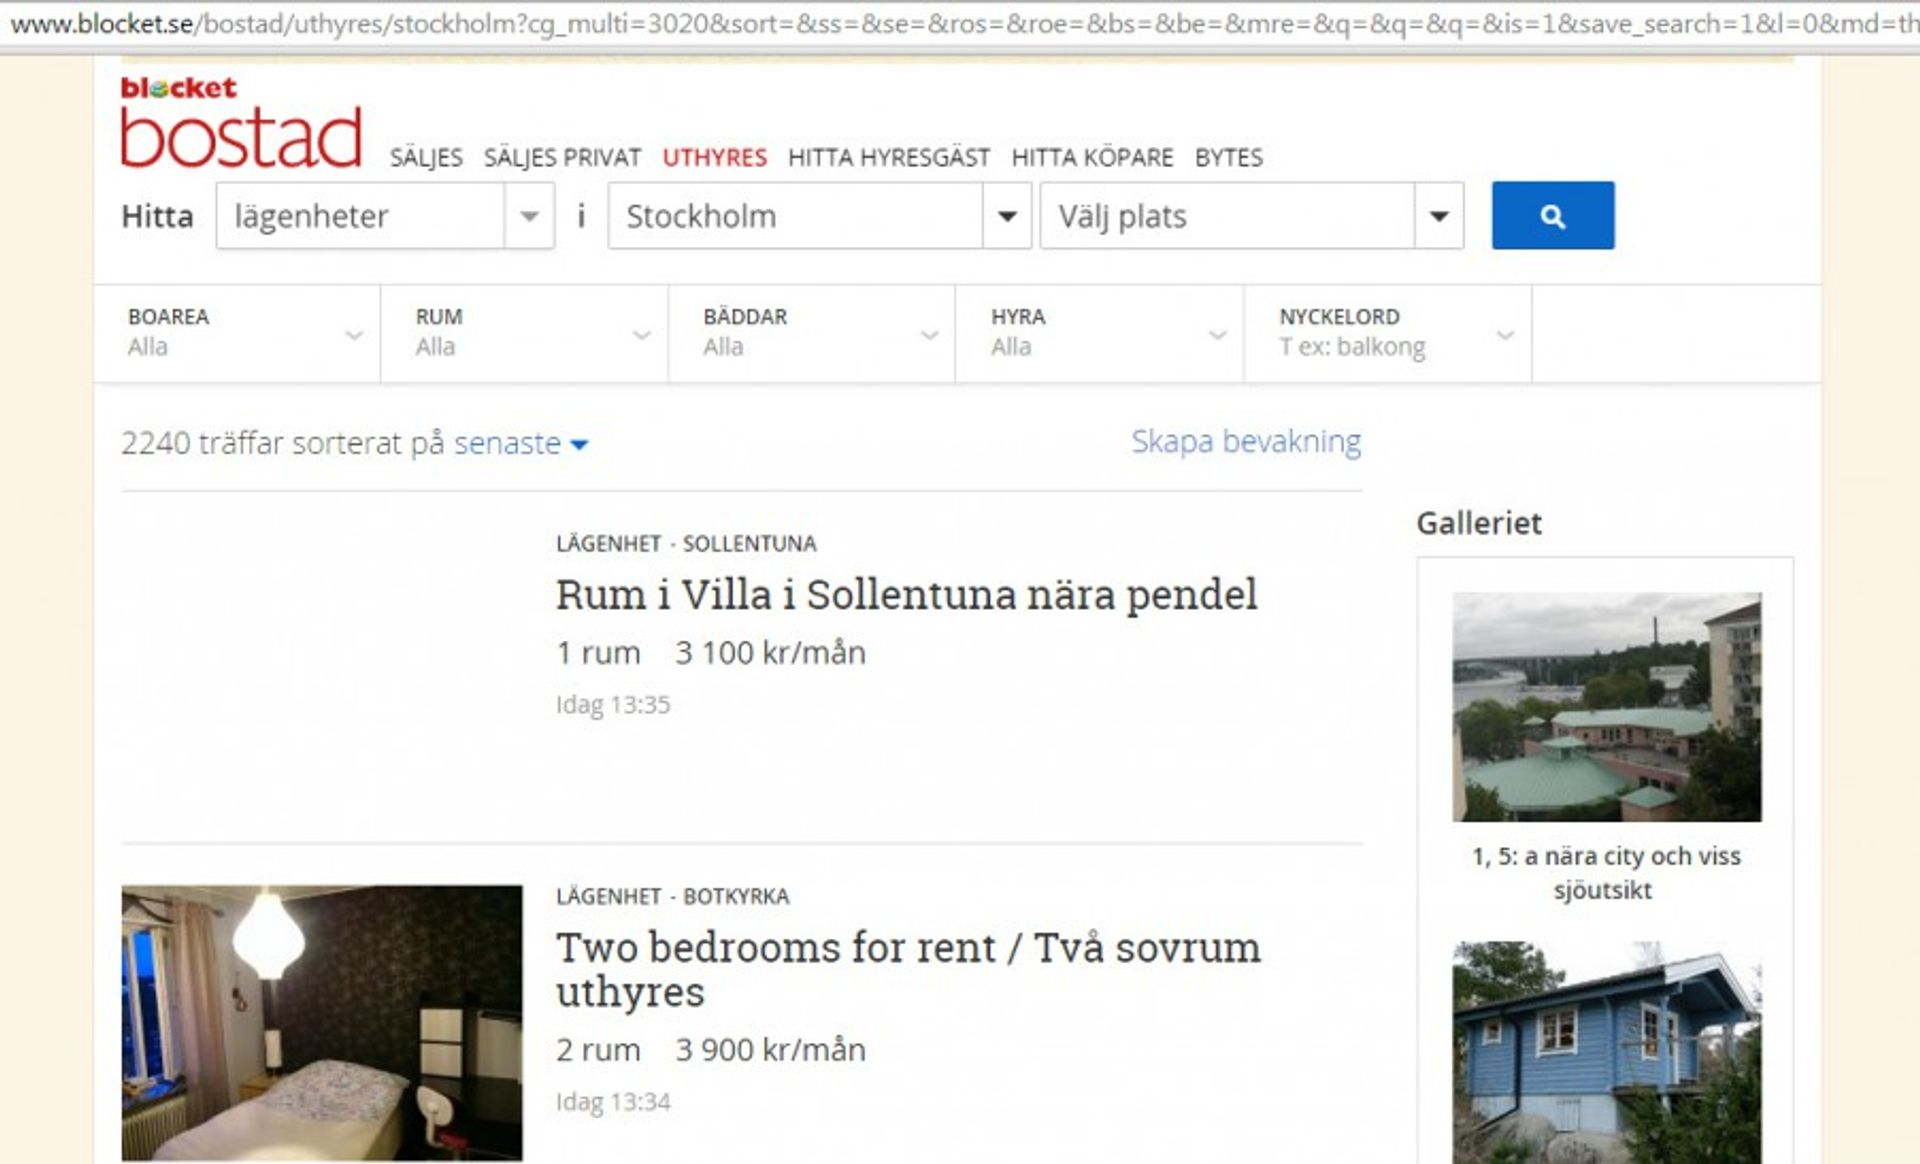 Hyr bostad i Stockholm - Blocket Bostad - Google Chrome 2015-03-08 140016.bmp